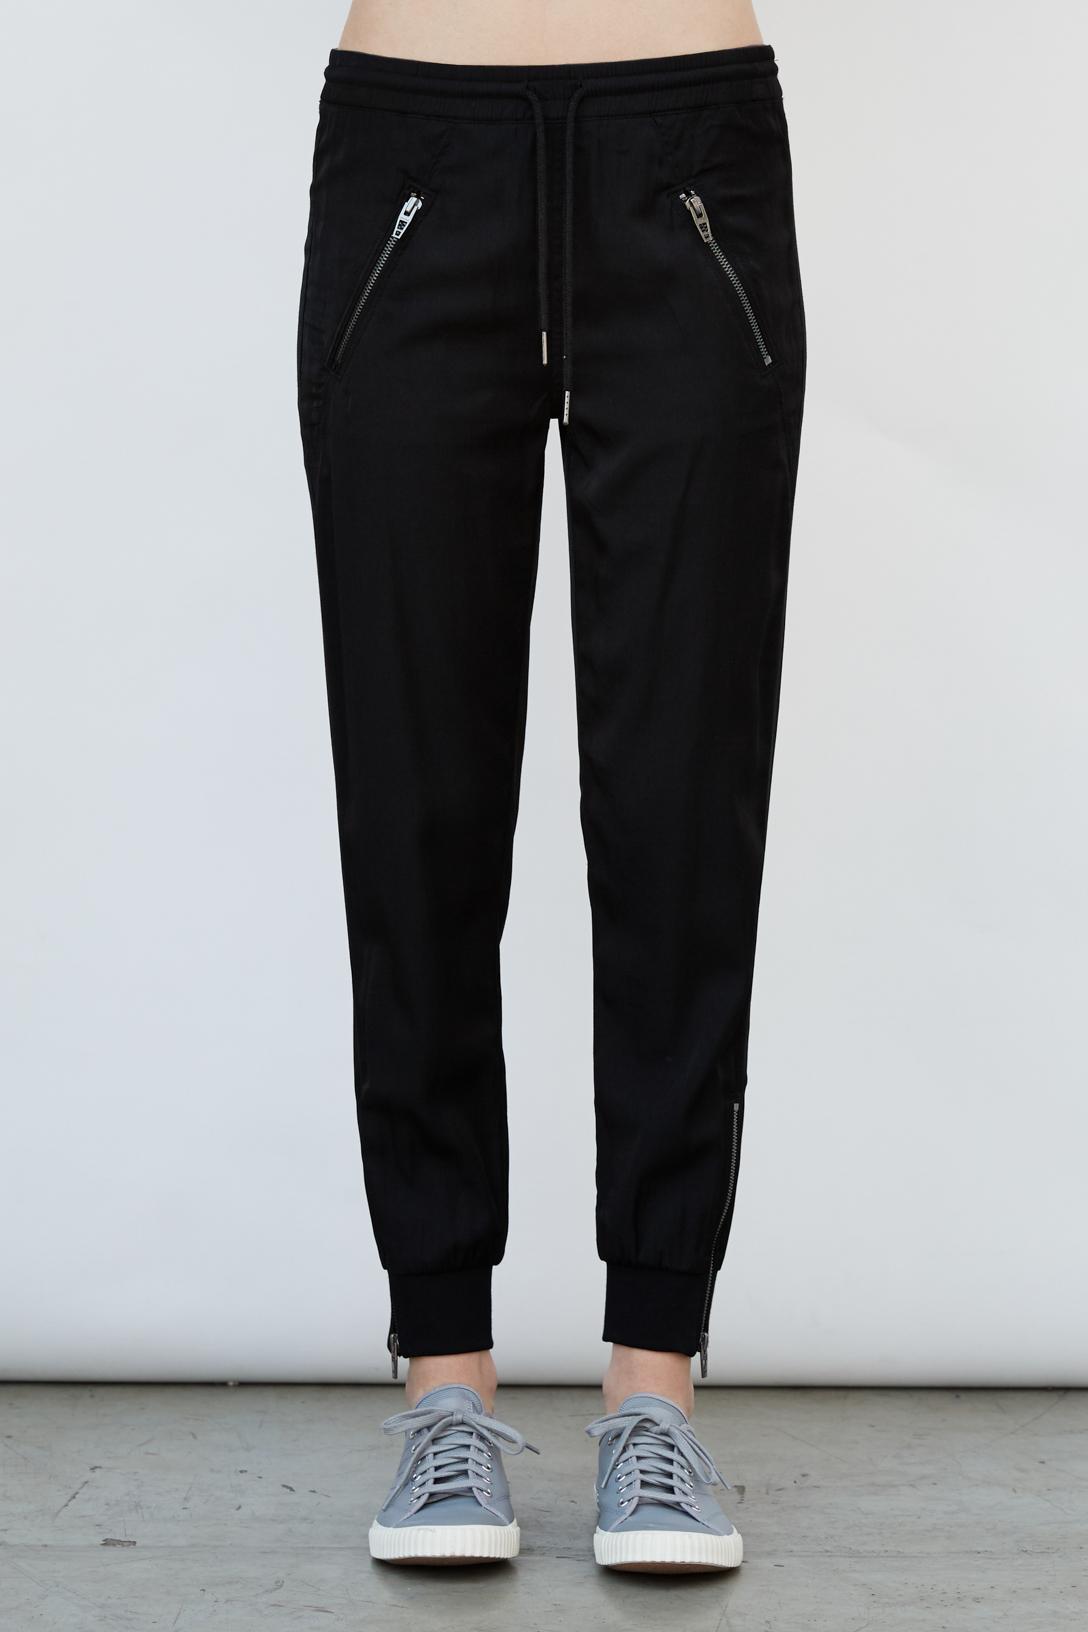 black sweatpants blank - photo #21